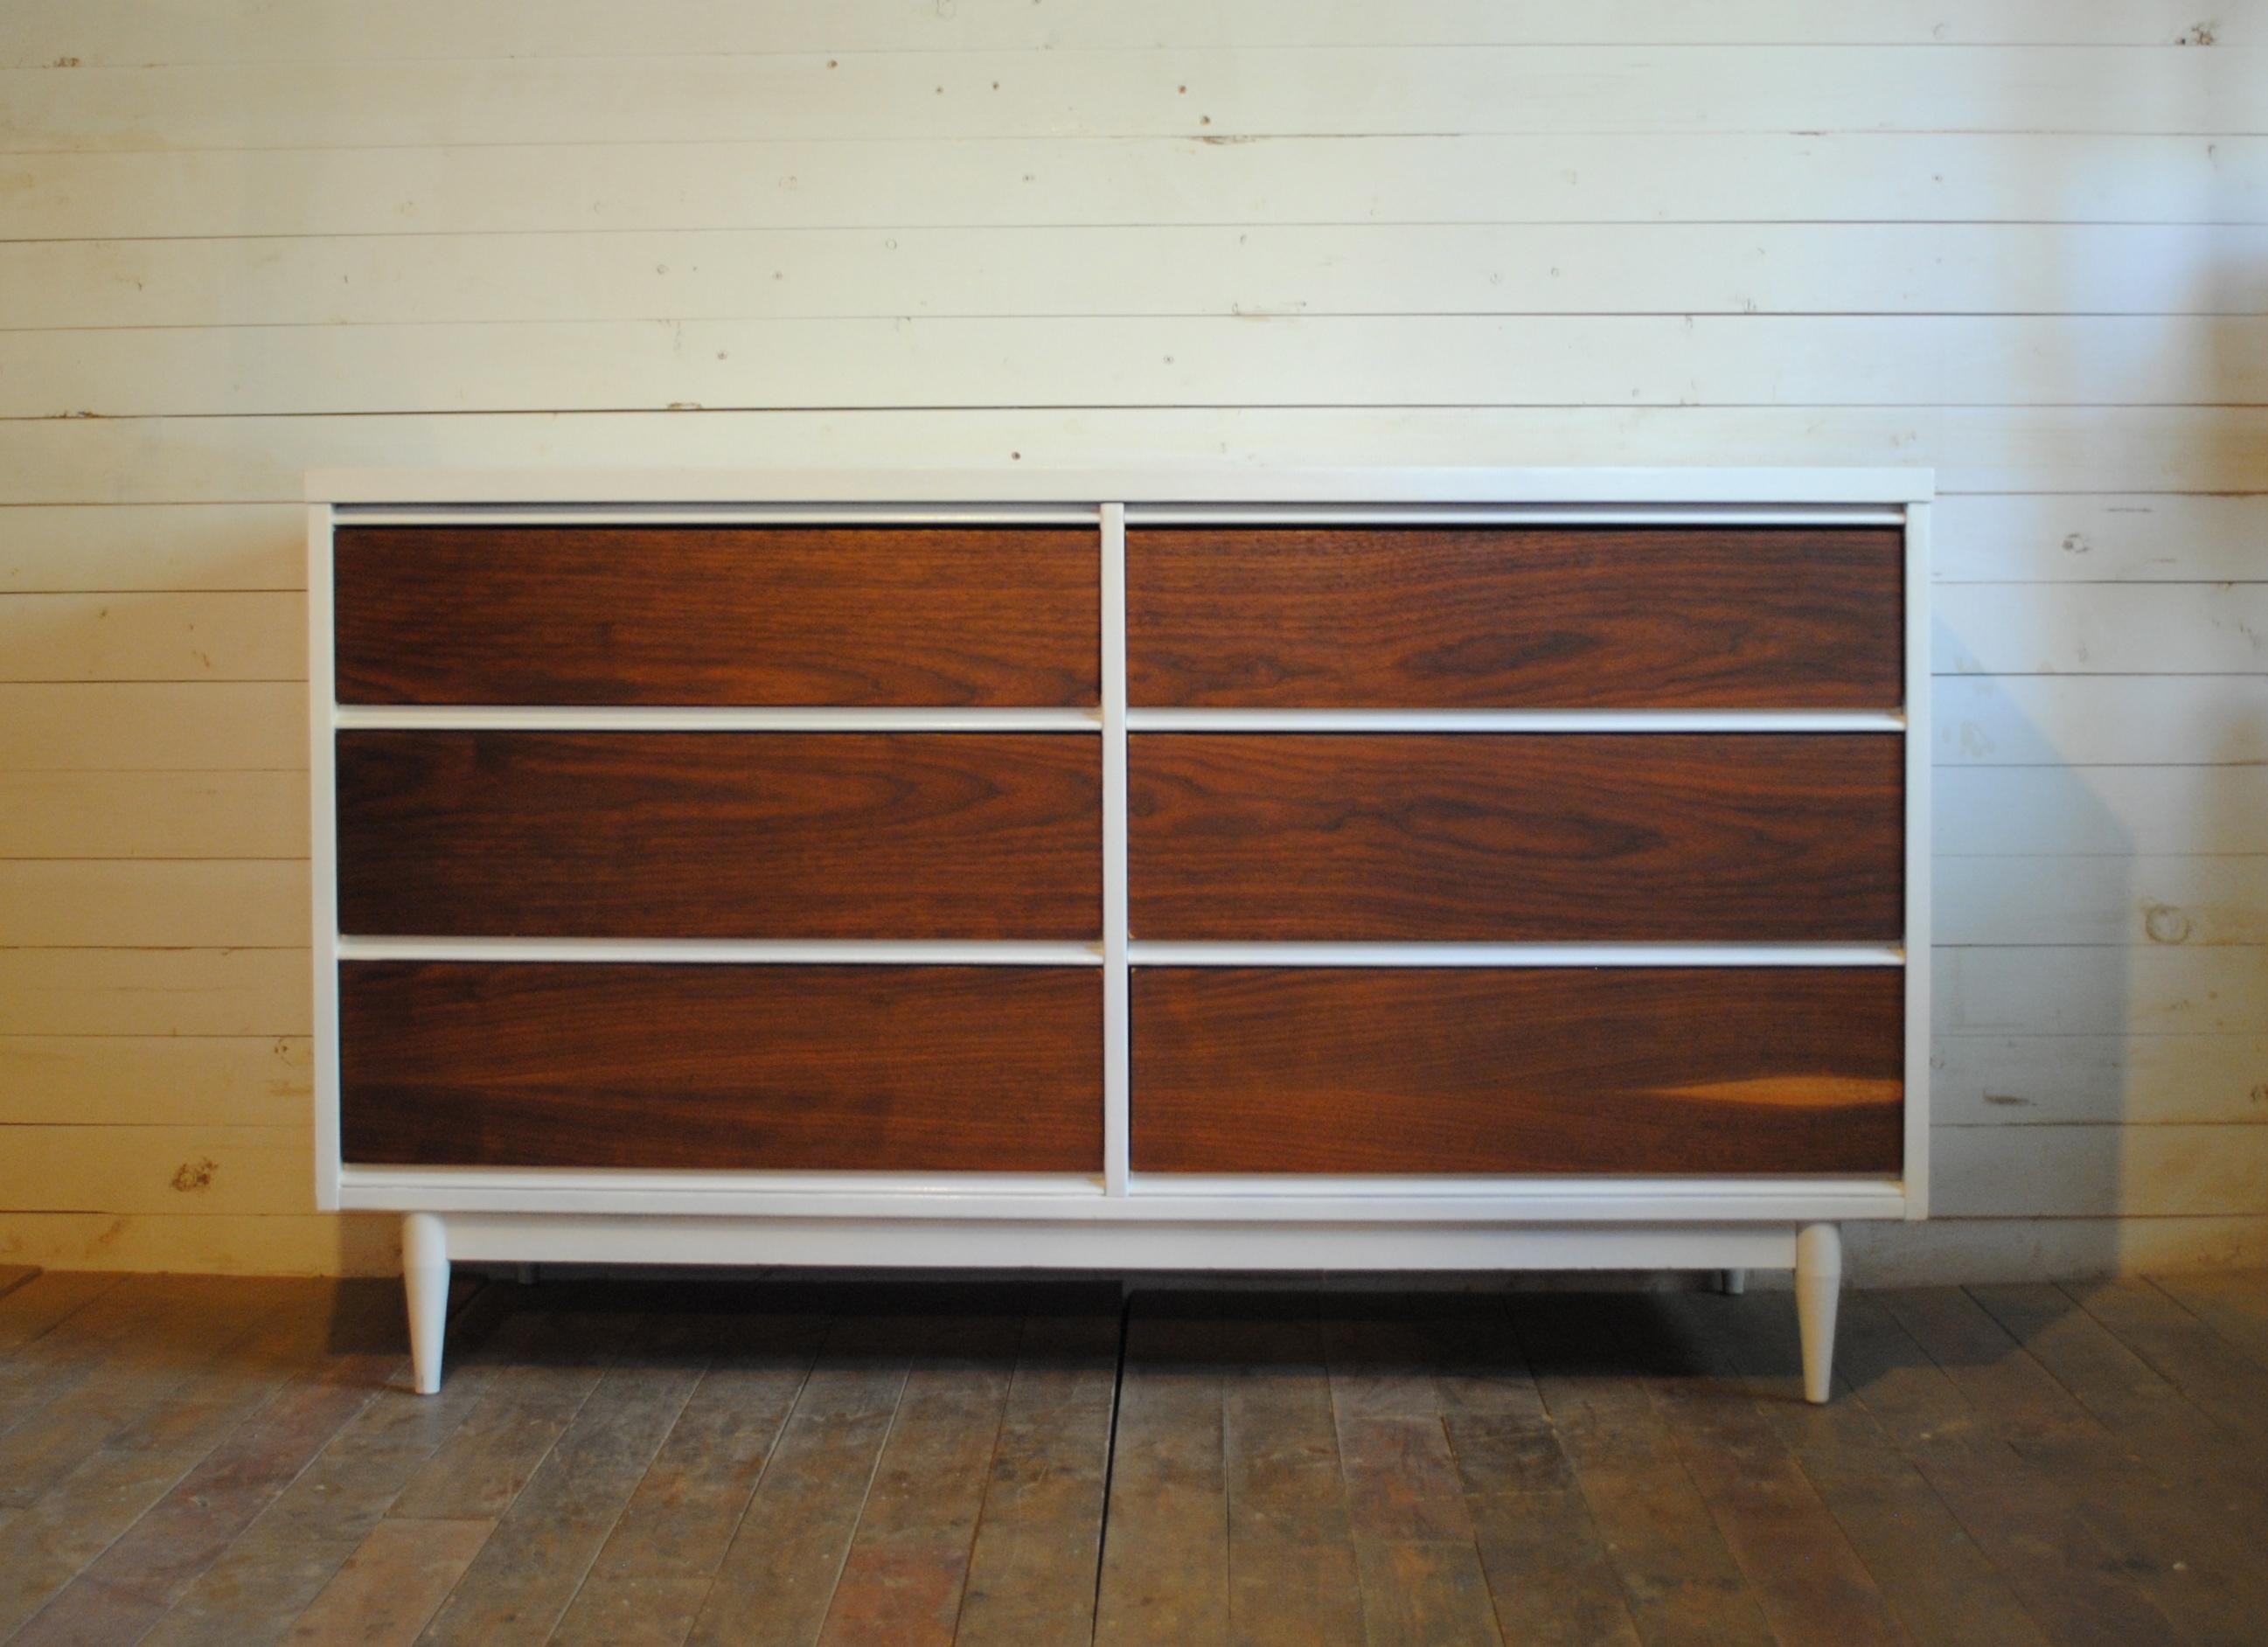 Ikea Malm Credenza : Mid century modern six drawer dresser credenza phylum furniture